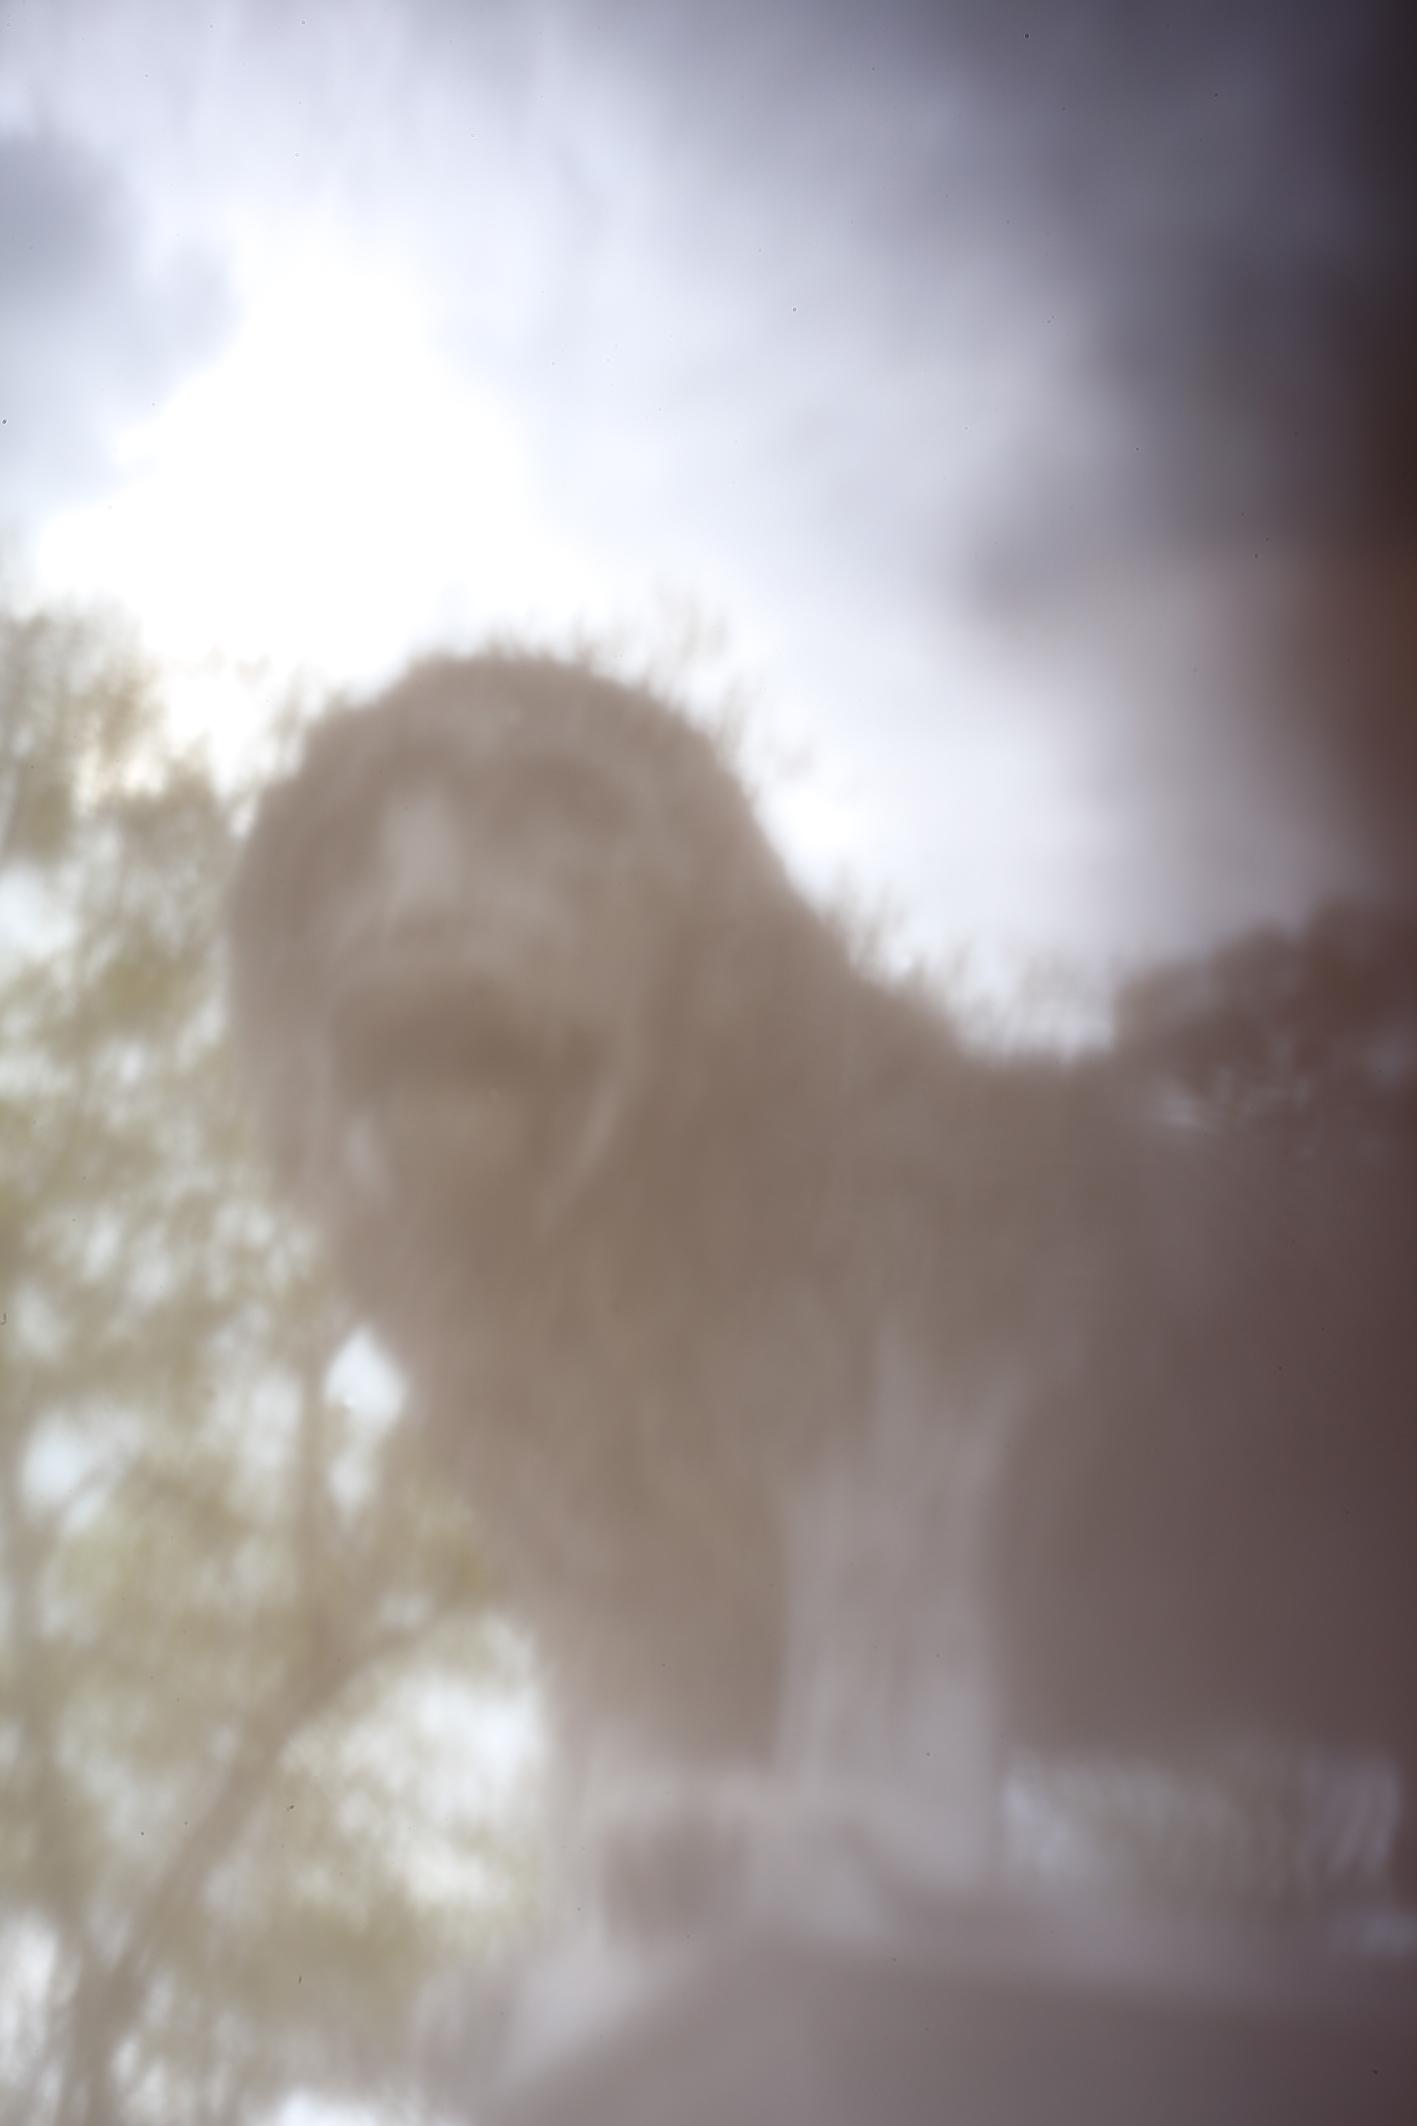 'The Dream', 2011/15, Pinhole photograph, laser-print on 180gsm cartridge paper, 12 x 18 cm